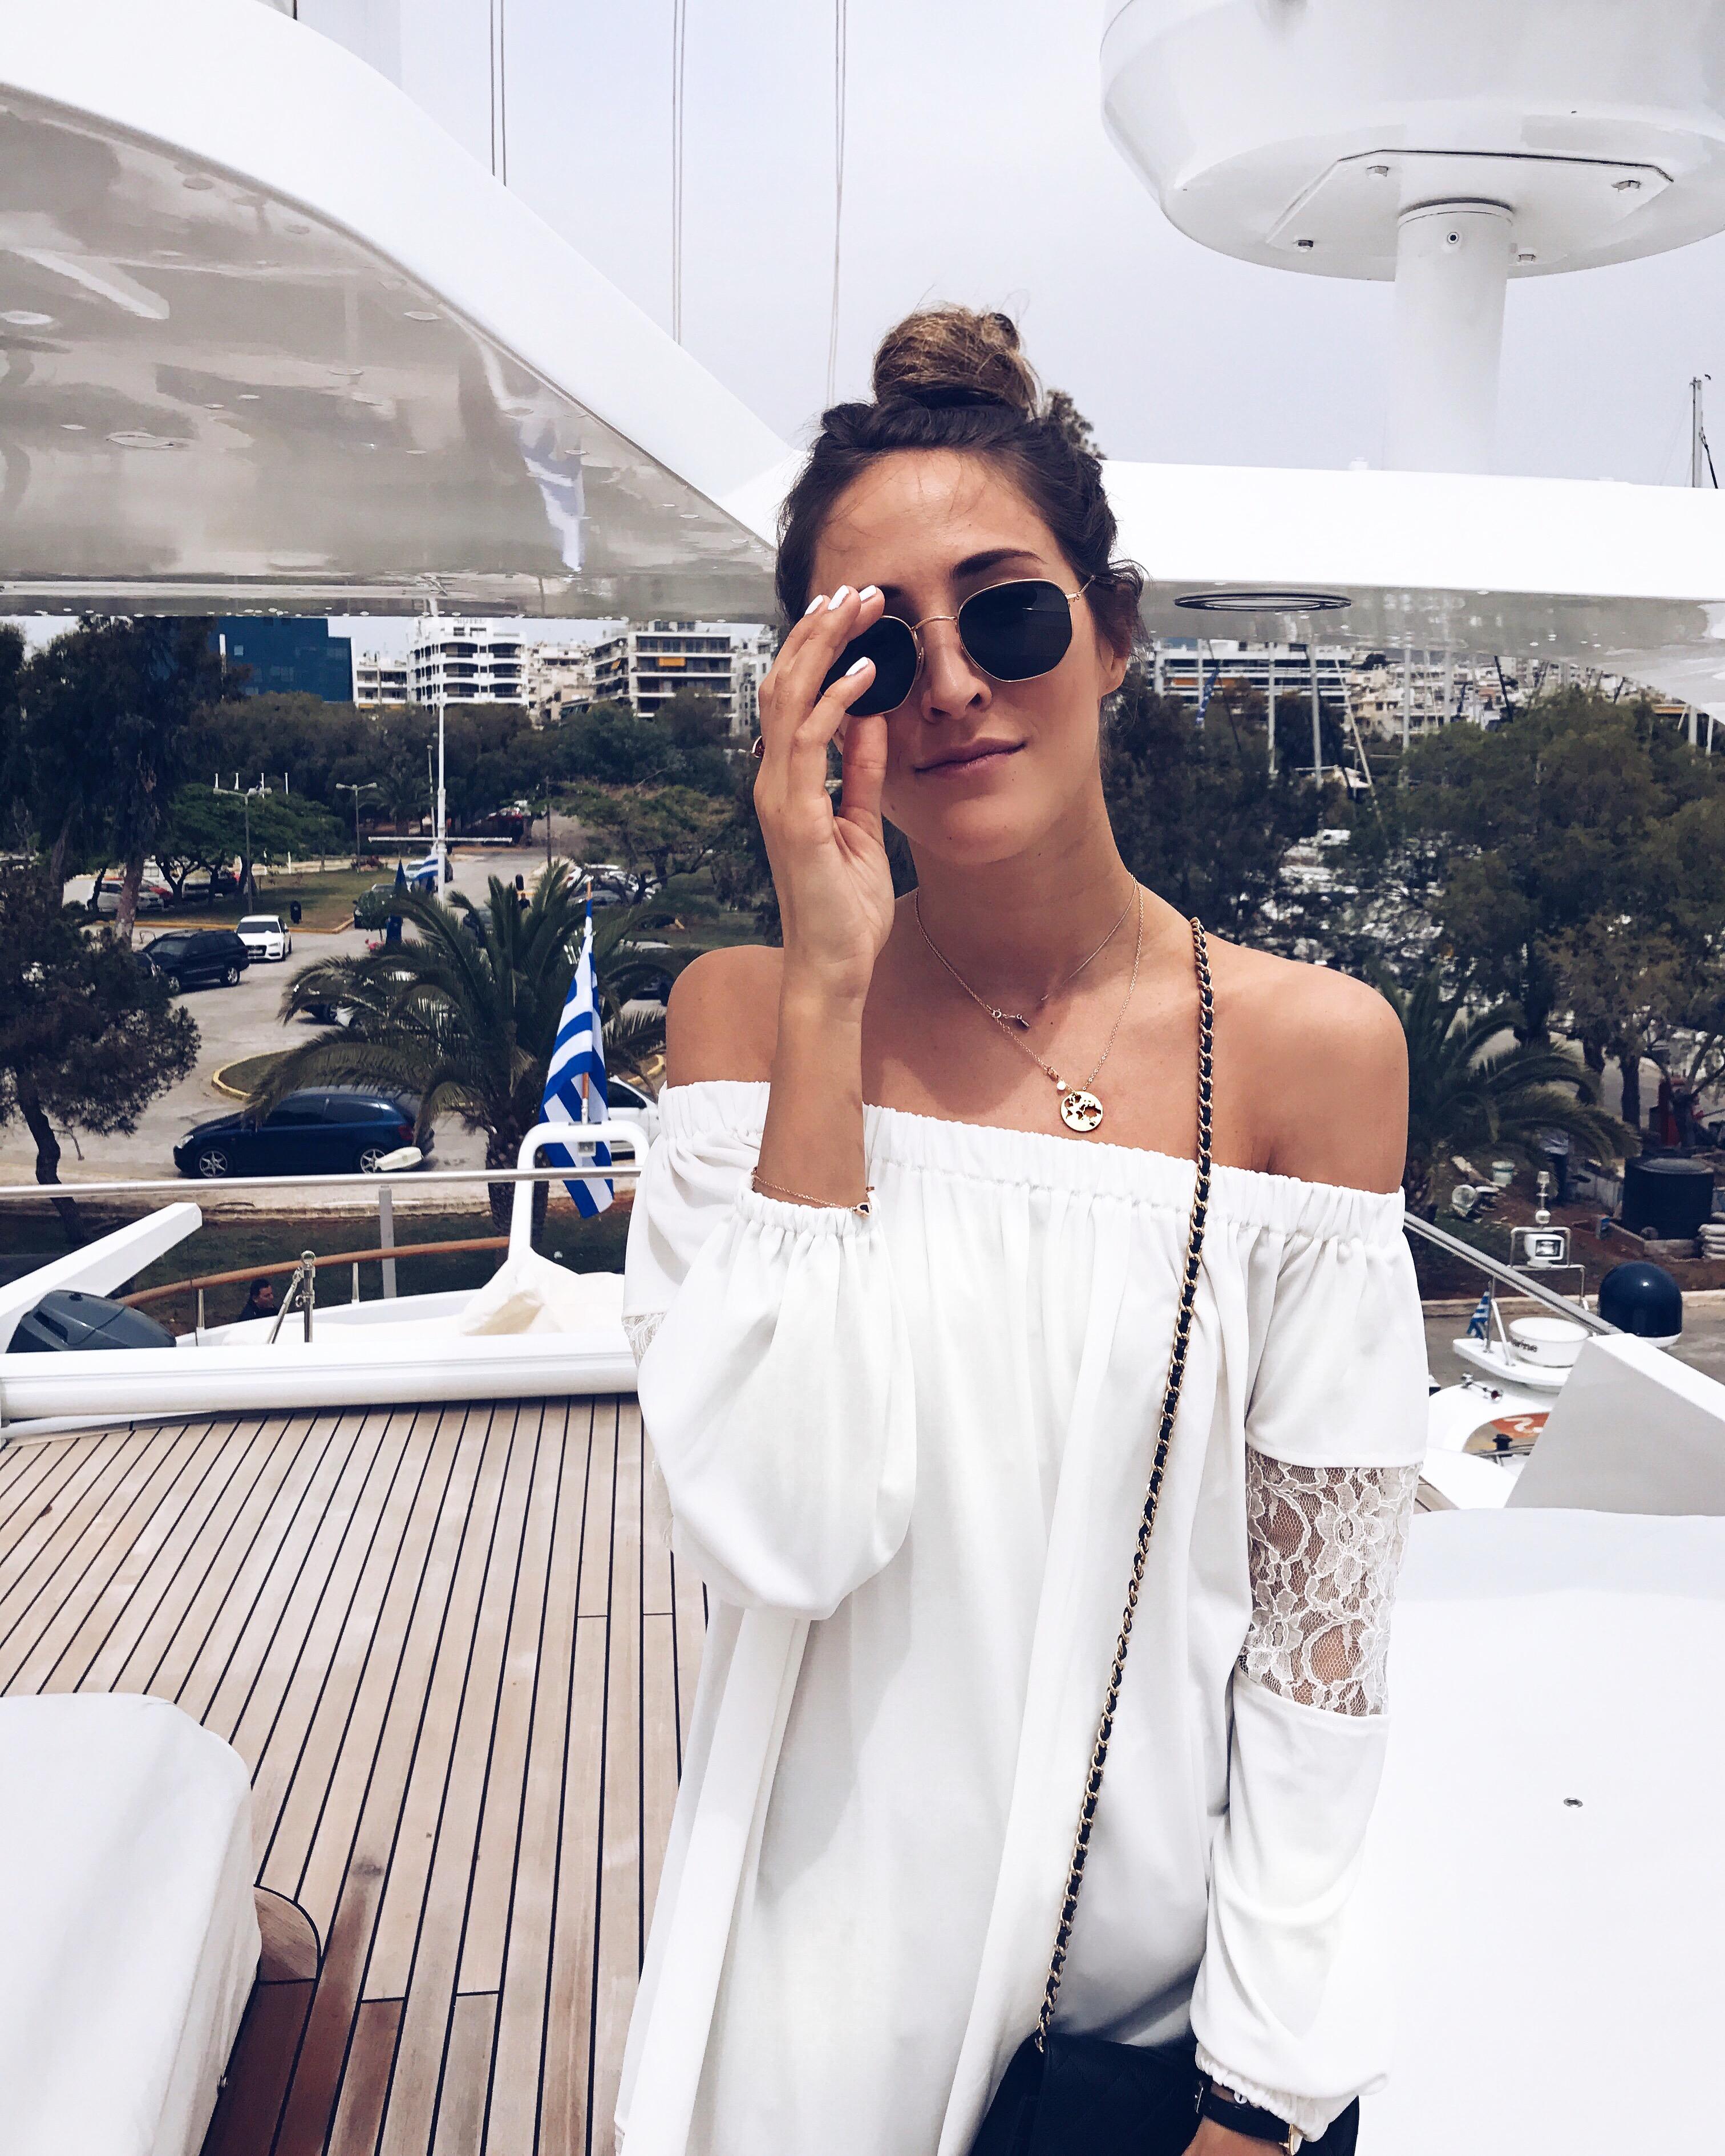 linda_tsetis_worlds_affair_boat_trip